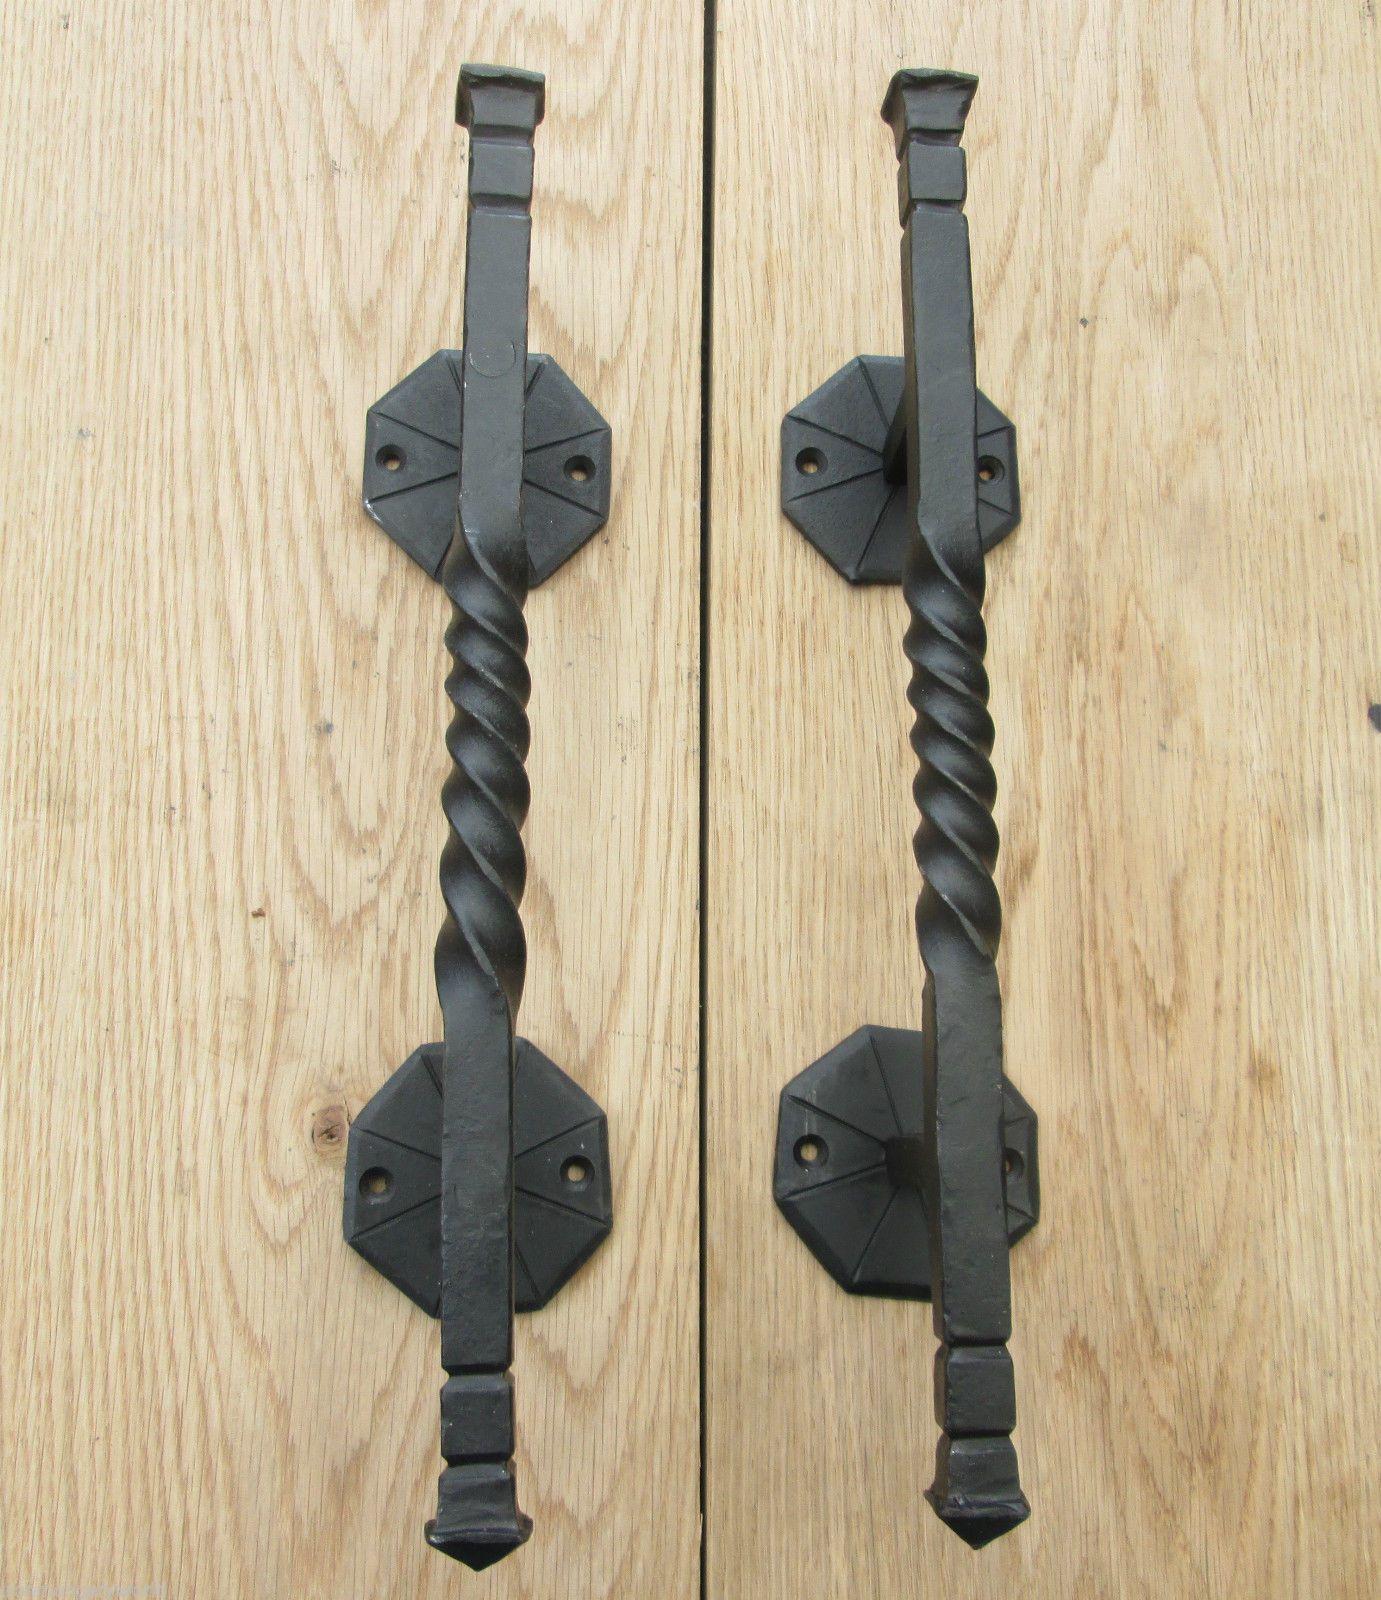 Details about 1 pair HAND BLACKSMITH DECORATIVE